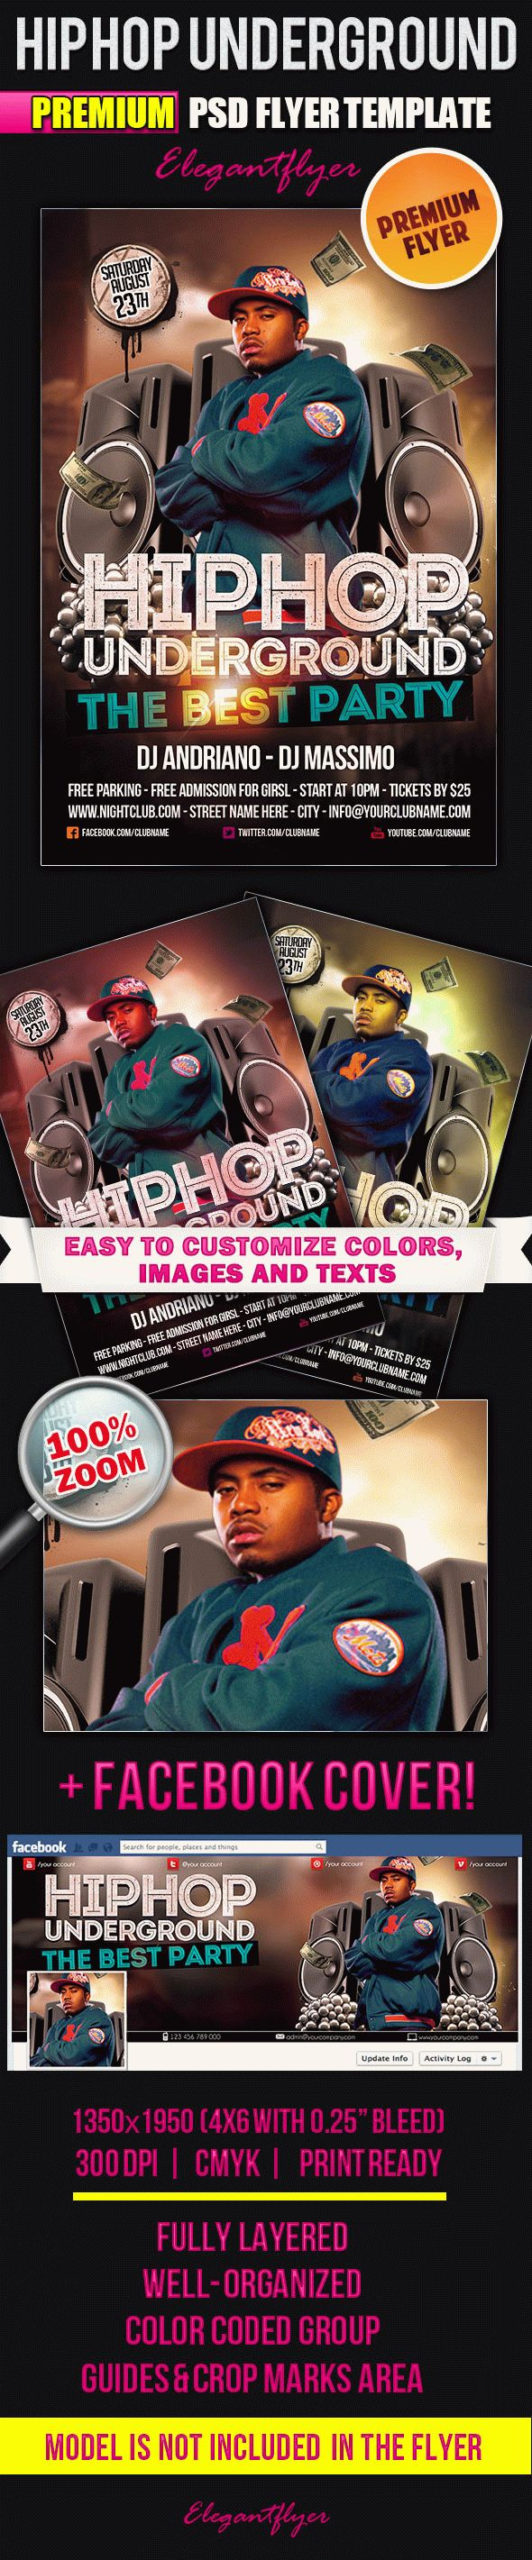 Hip Hop Underground  Flyer Psd Template Elegantflyer pertaining to Hip Hop Certificate Template 6 Explosive Ideas